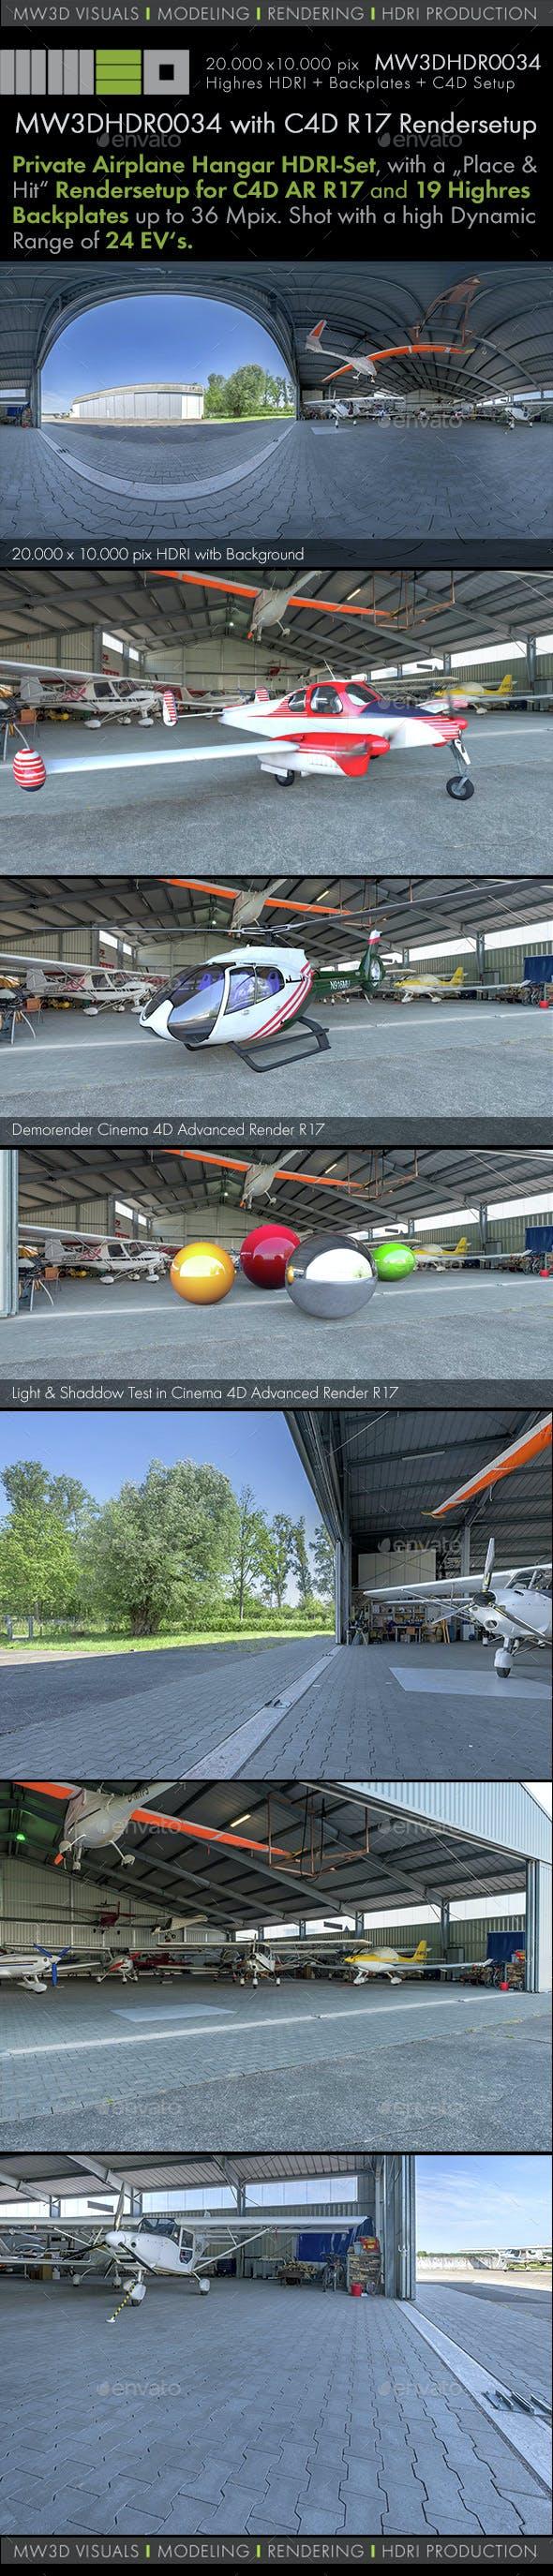 MW3DHDR0034 Aviation-Shop / Airplane Hangar HDRI Set - 3DOcean Item for Sale